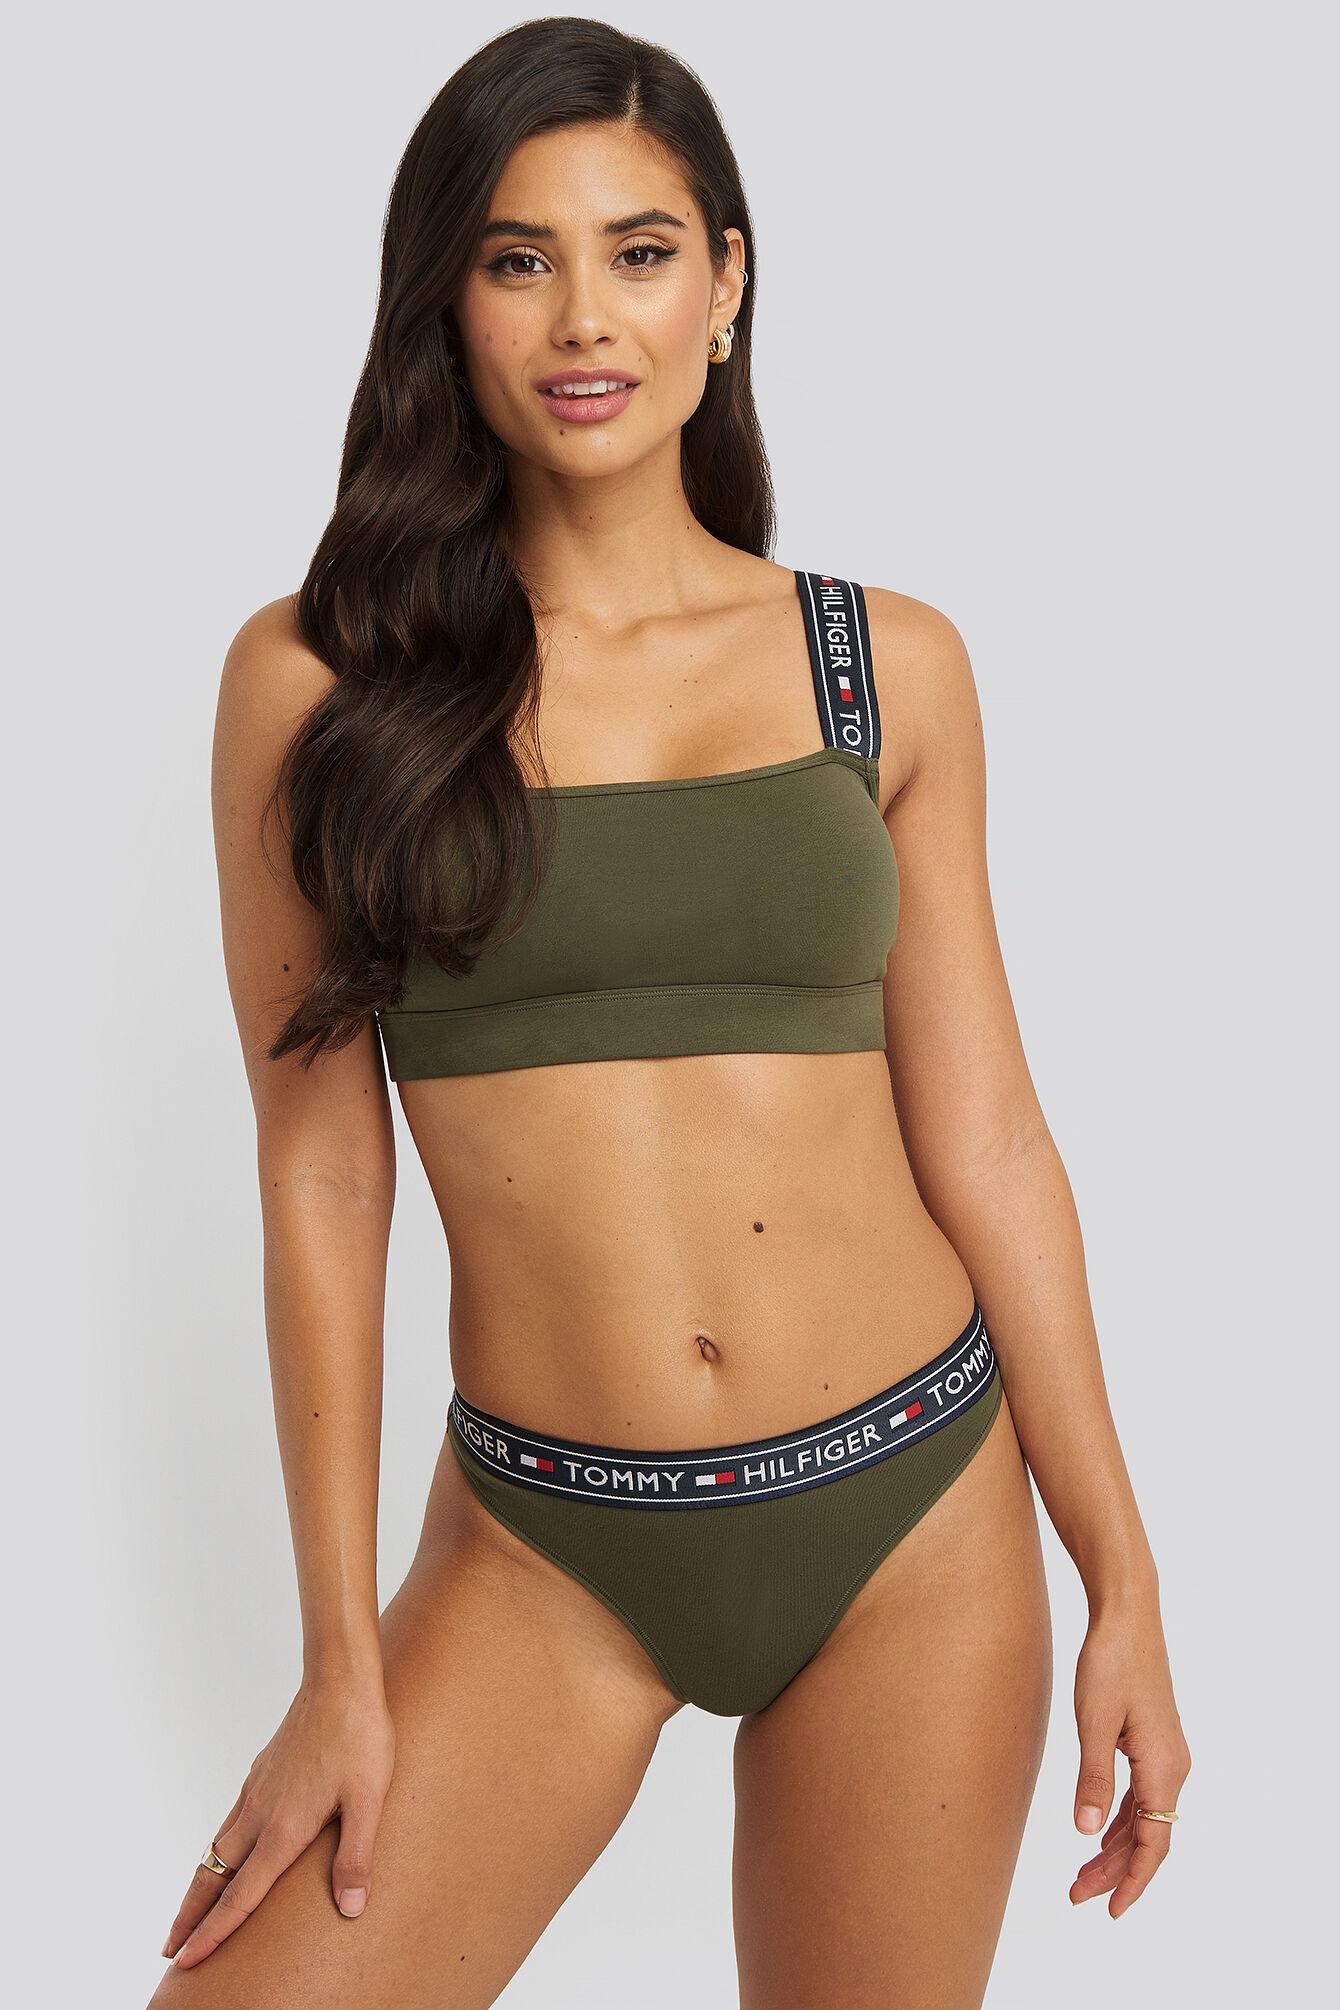 Tommy Hilfiger Brazilian Cotton Panties - Green  - Size: Small